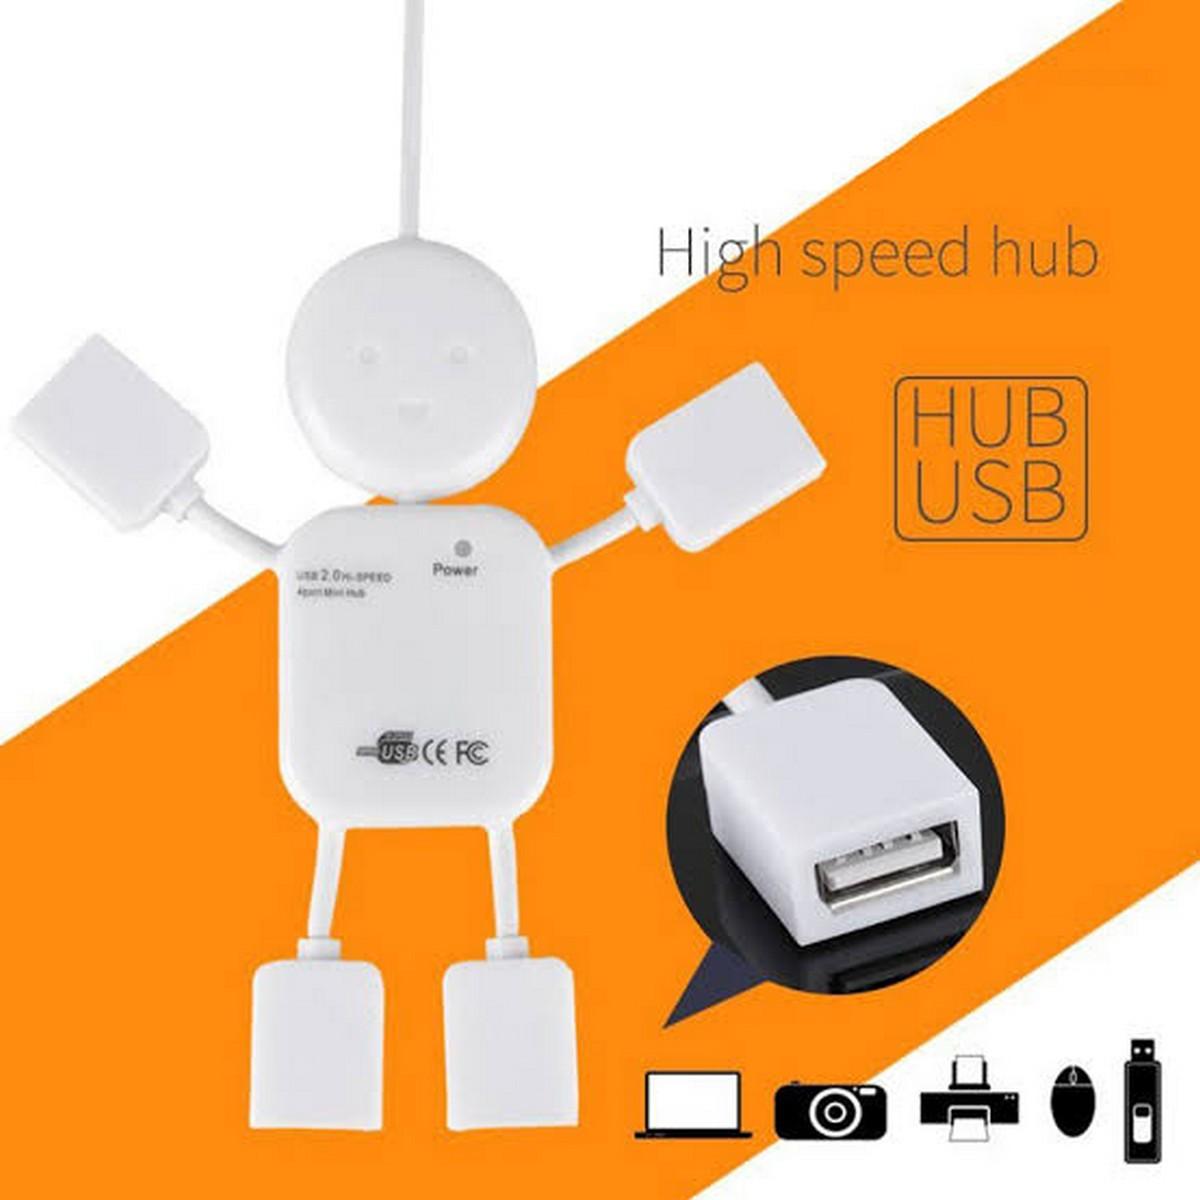 USB 4 Ports HUB Extension 2.0 - New Robot Shape Design - White